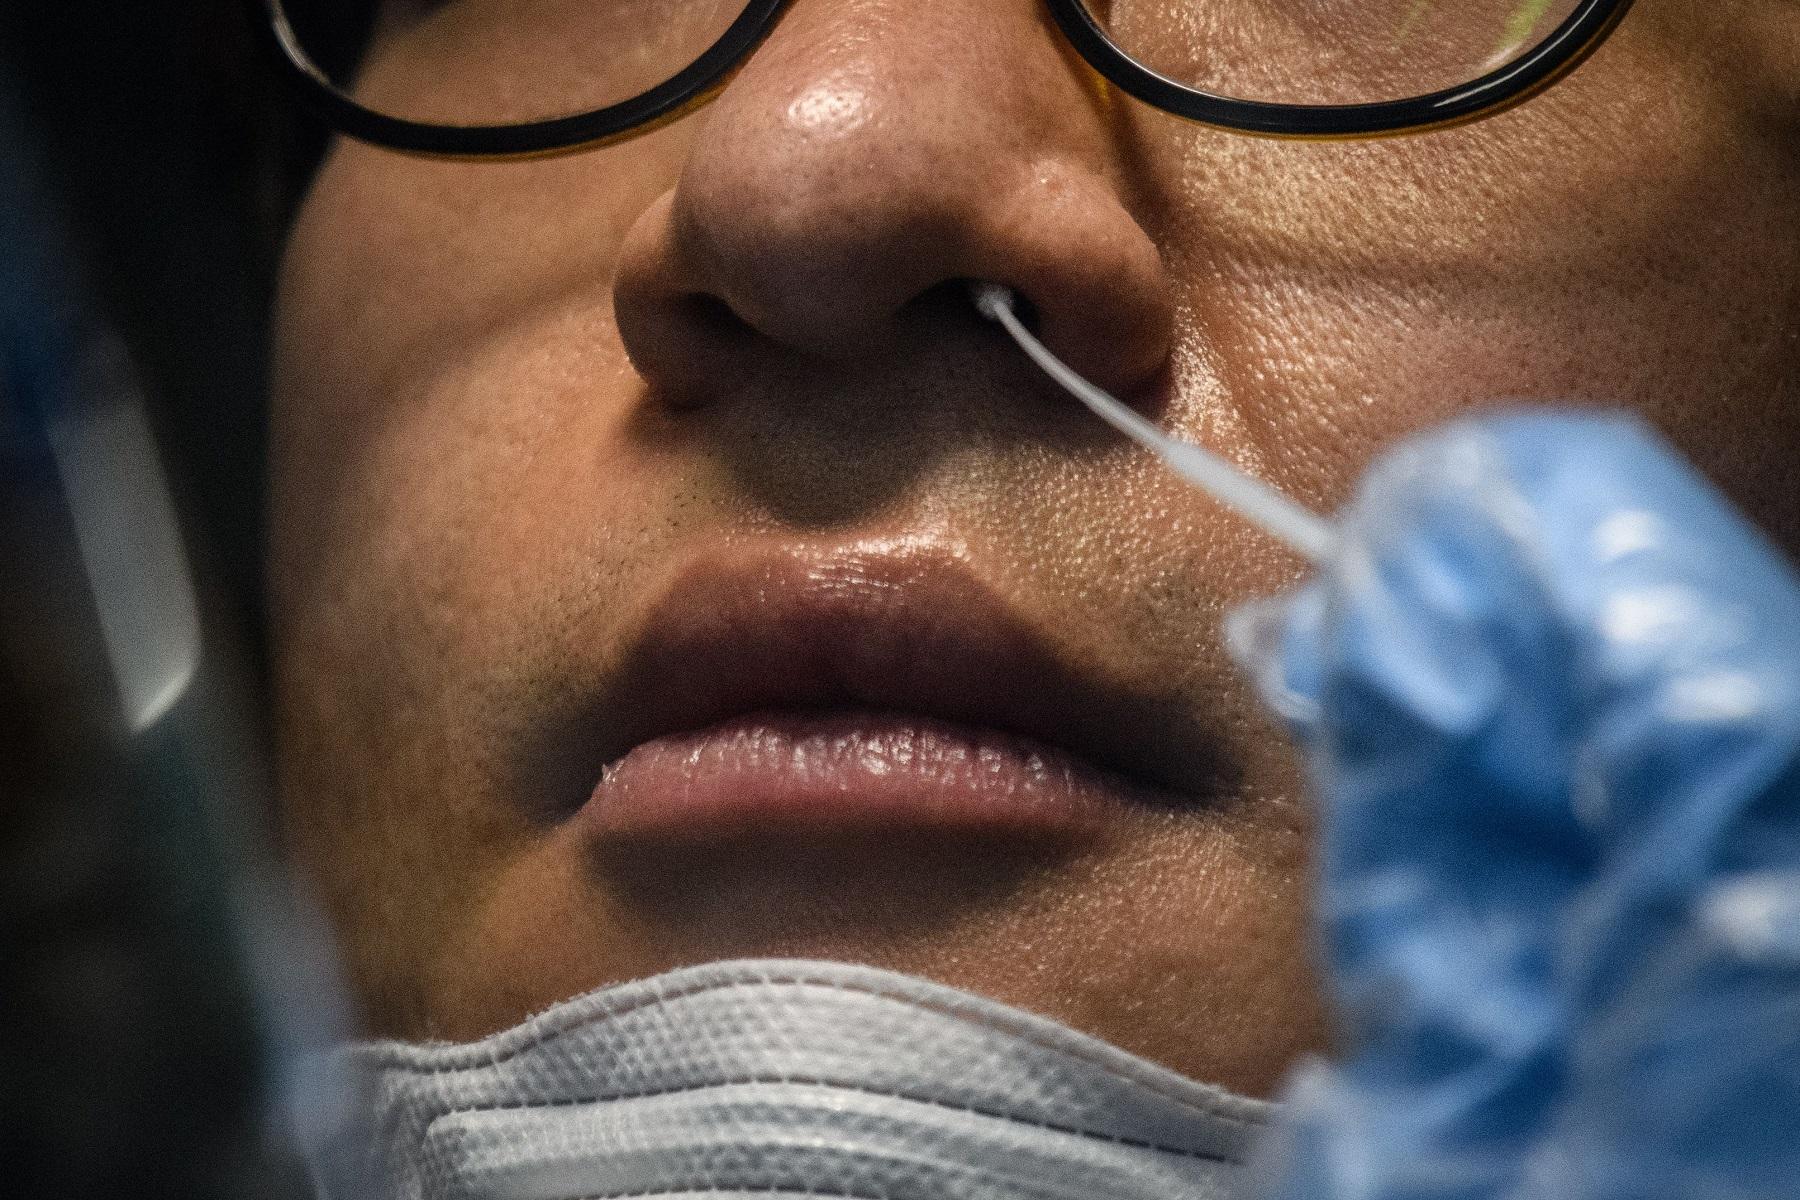 Self-test Φαρμακοποιοί: Πώς να διατηρήσετε το φαρμακείο σας σε ομαλή λειτουργία κατά τη διάρκεια της πανδημίας